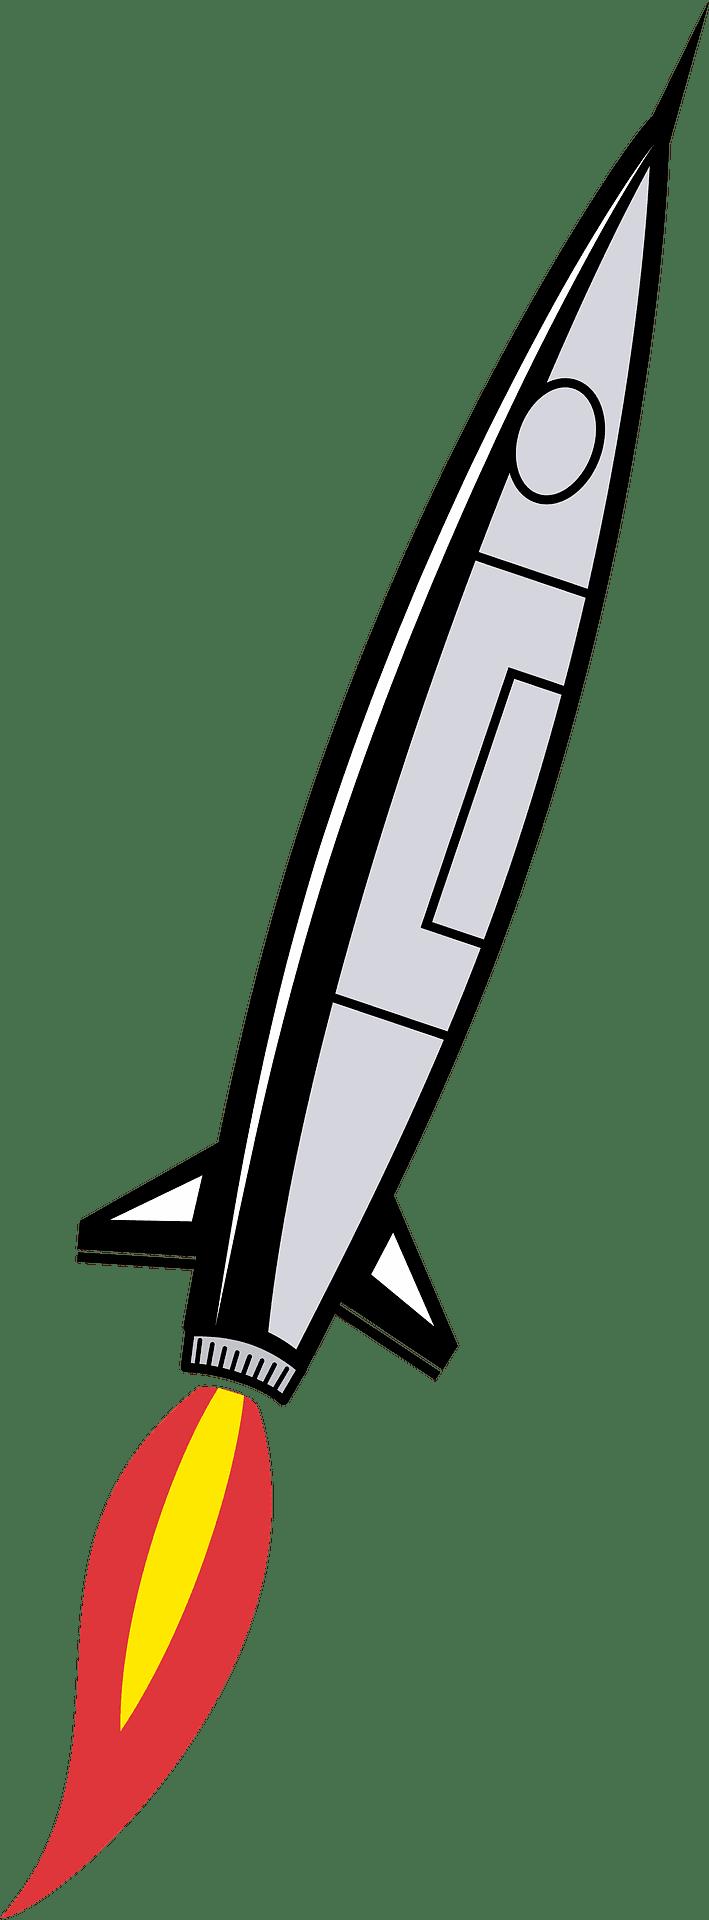 Rocket clipart transparent 3